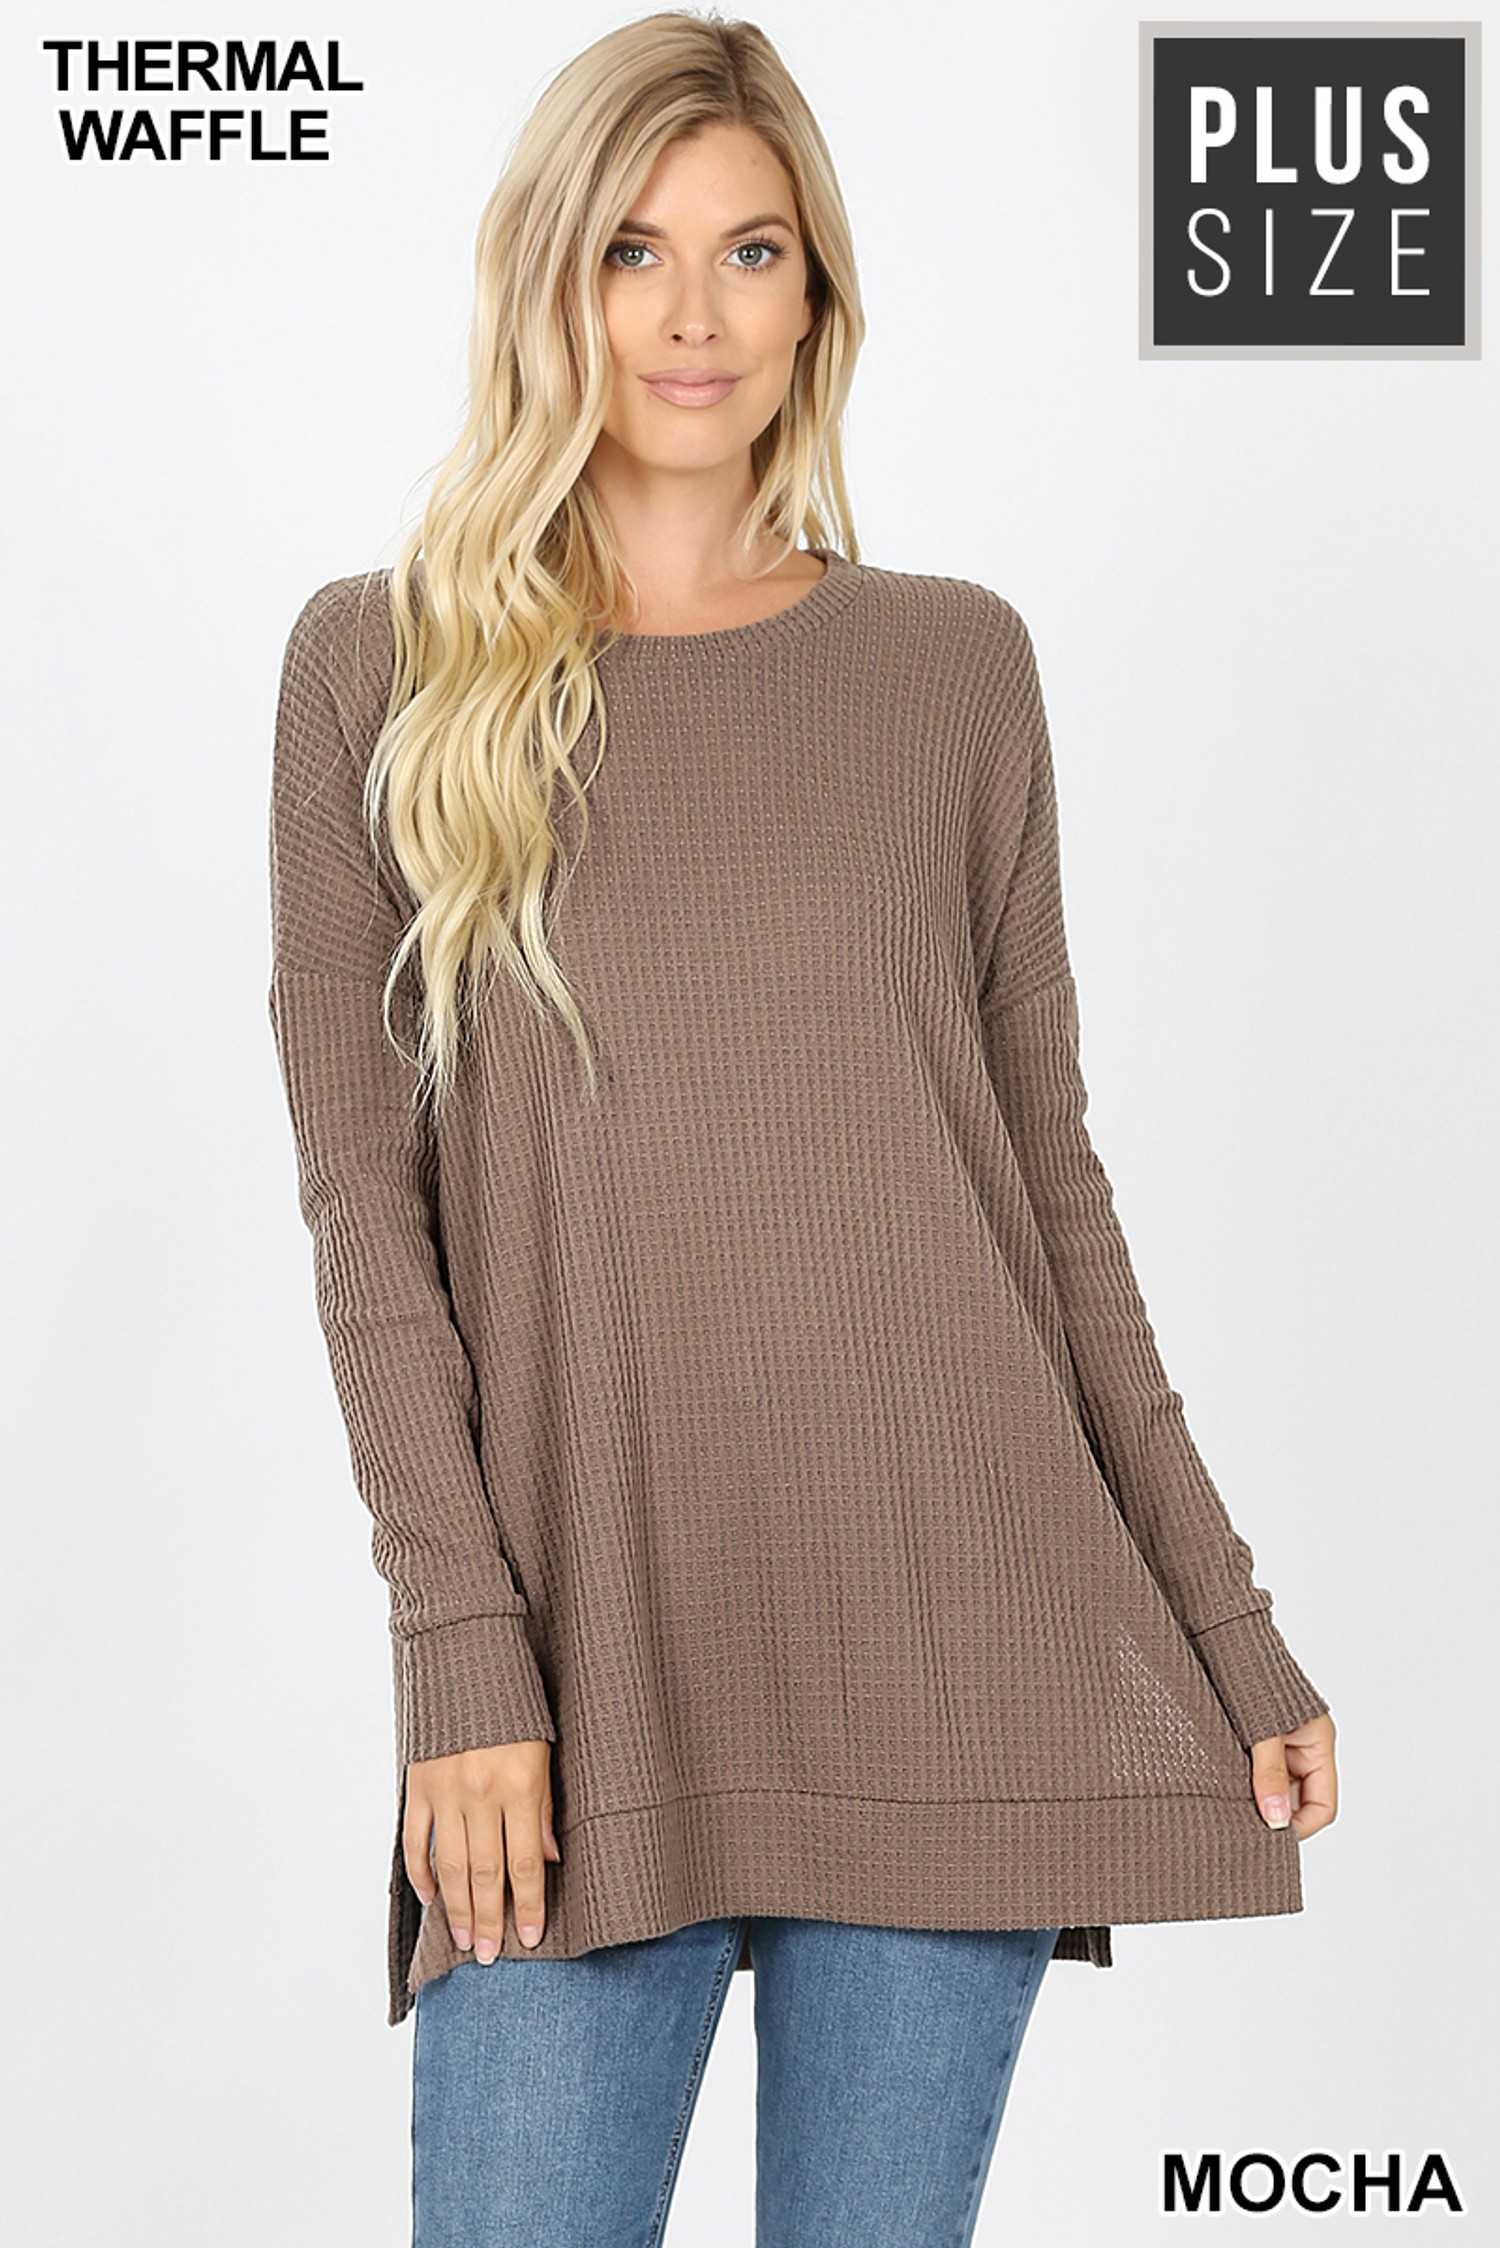 Front image of Mocha Brushed Thermal Waffle Knit Round Neck Plus Size Sweater